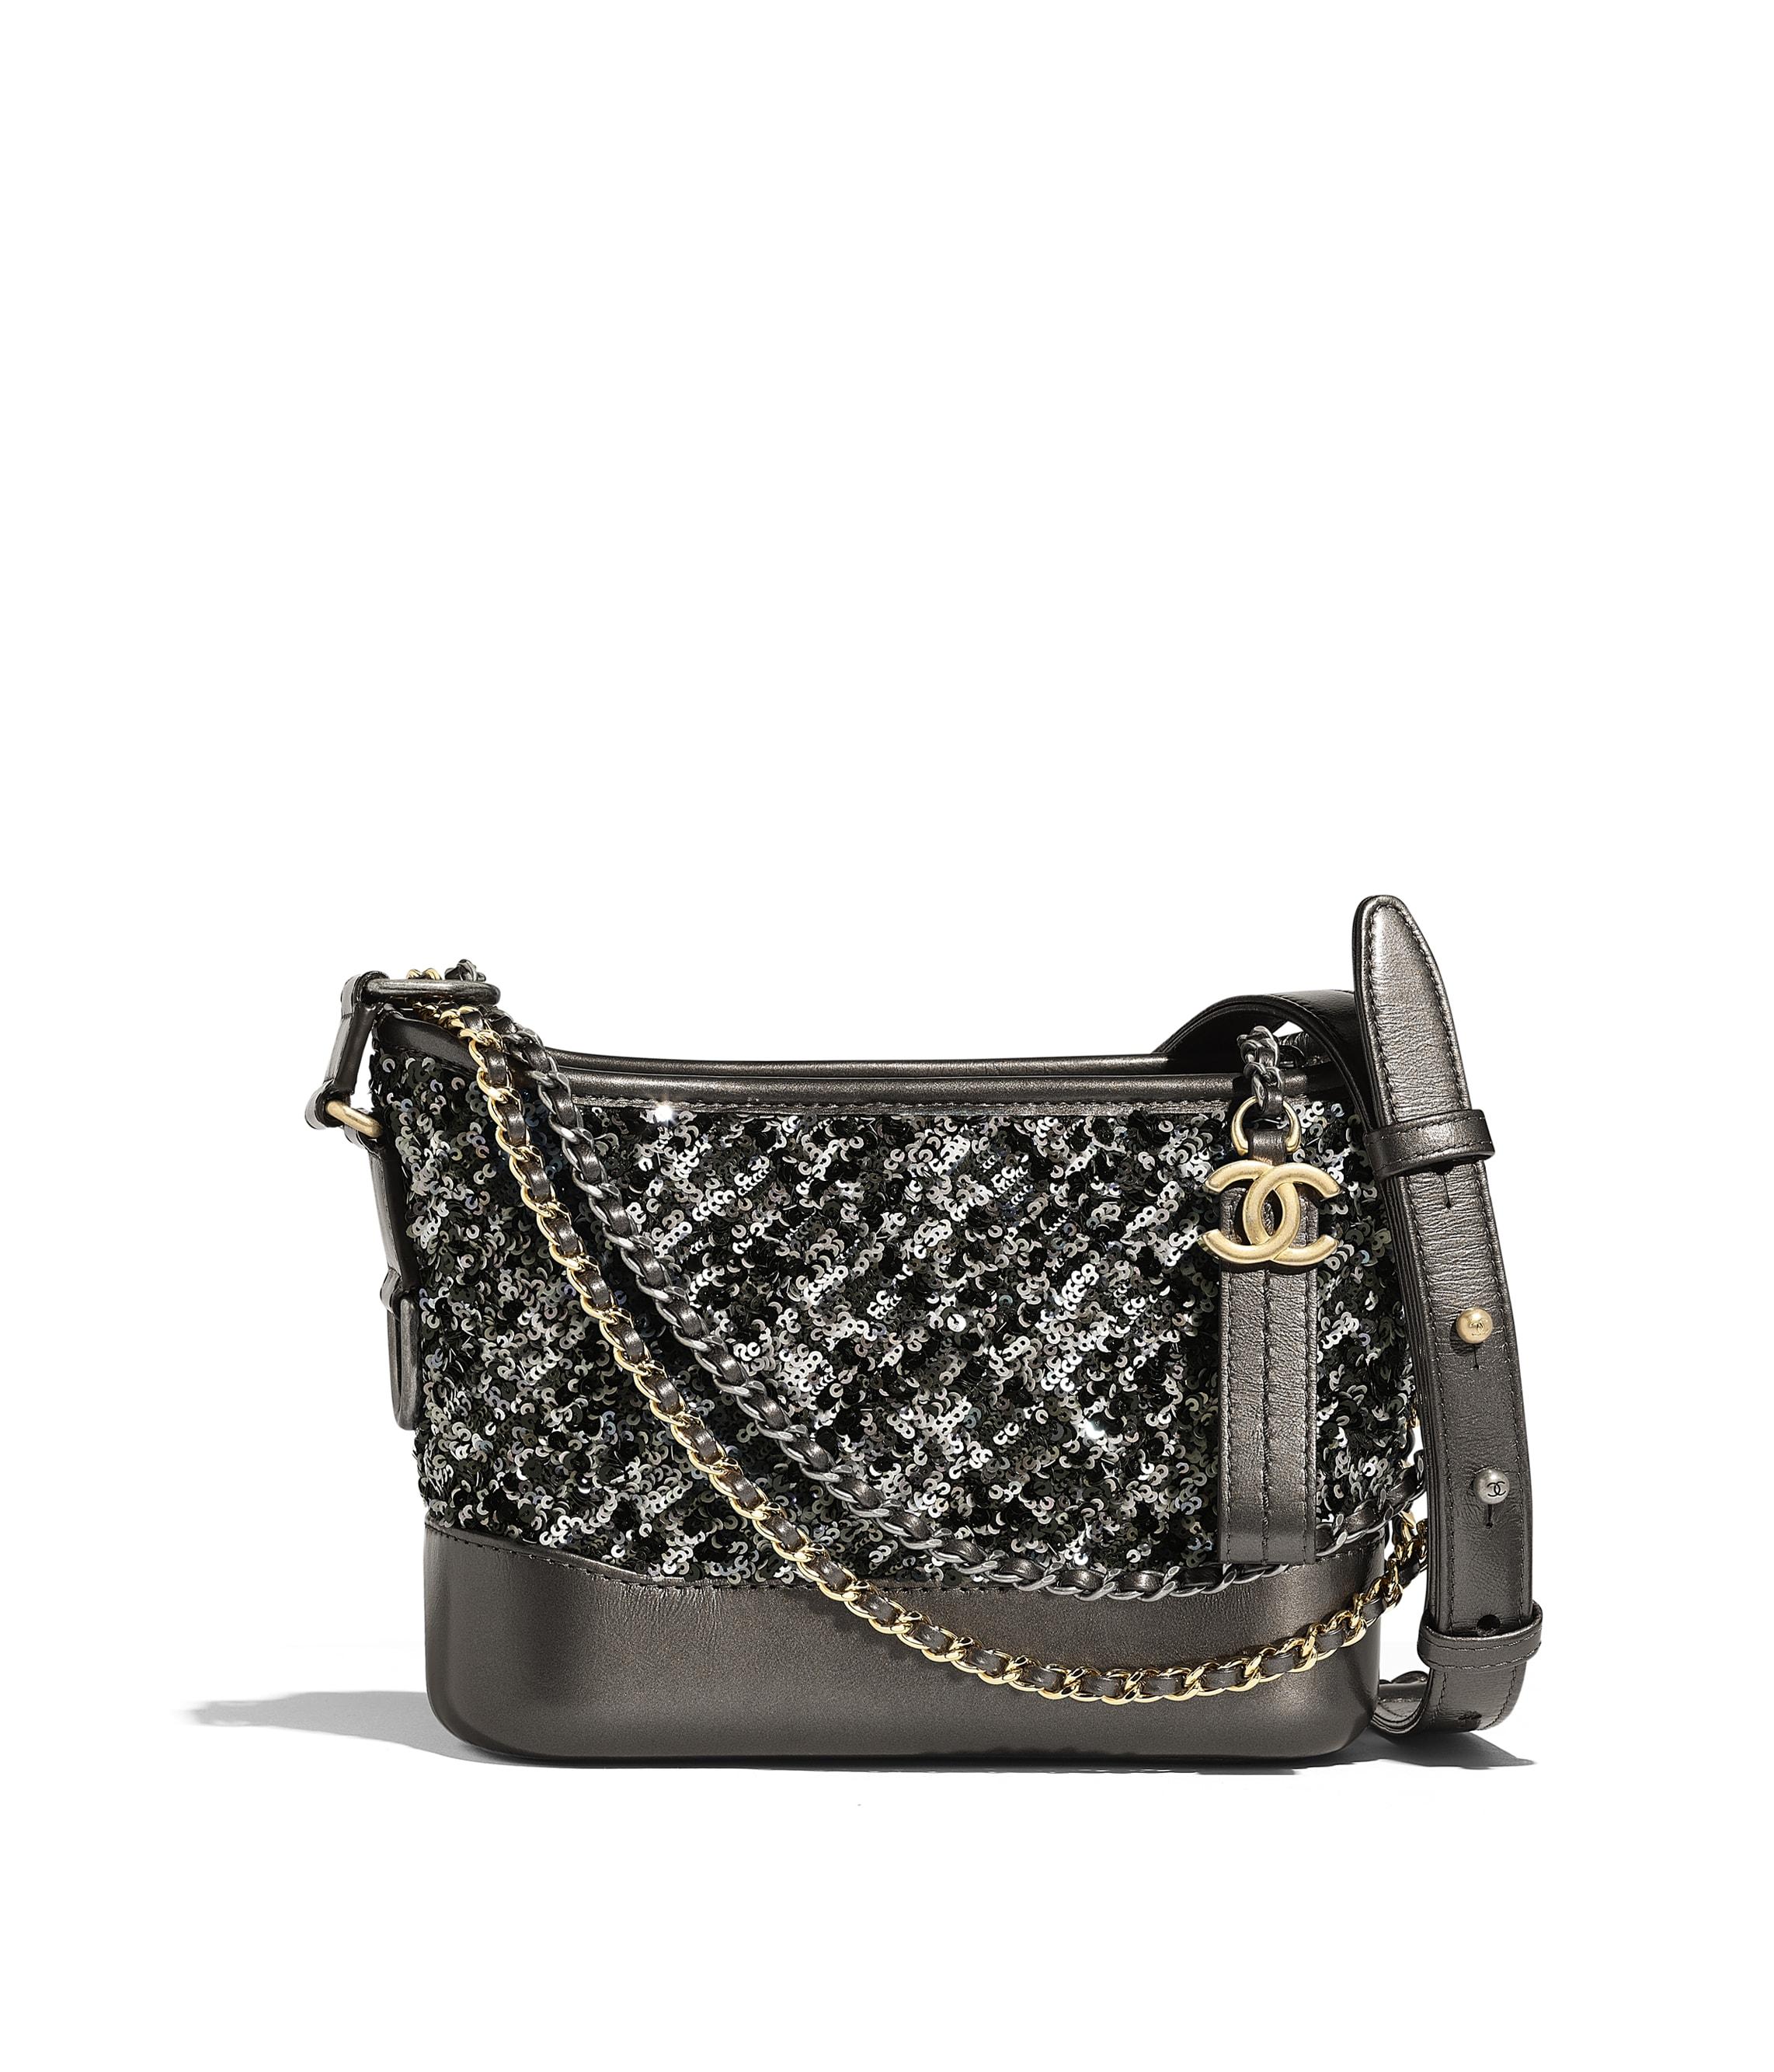 bfce9b915ee9 CHANEL's GABRIELLE - Handbags - CHANEL